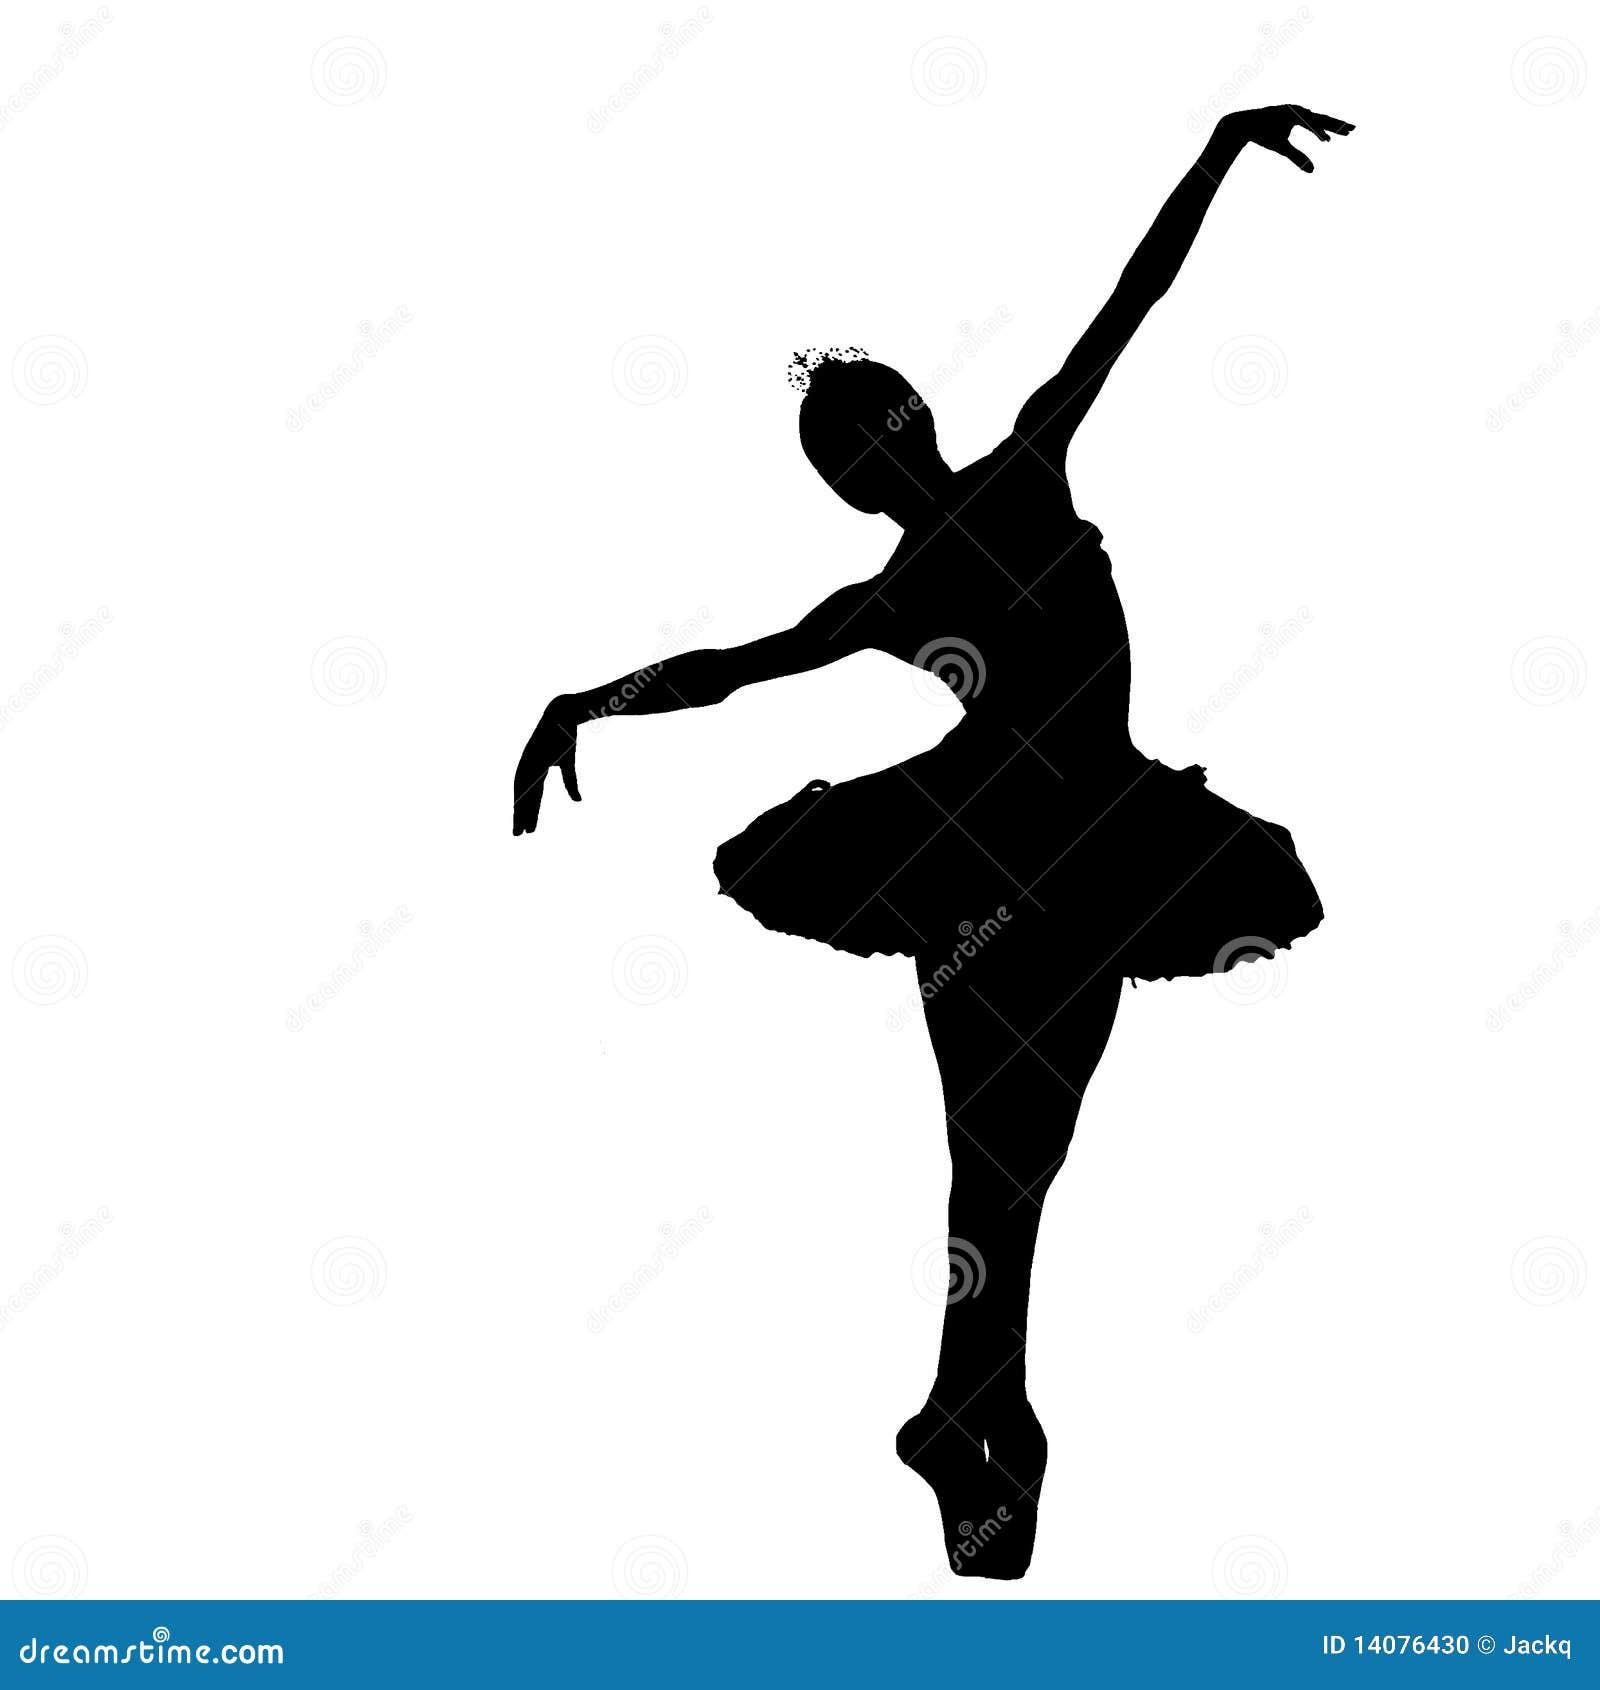 Clipart Bedroom 芭蕾舞女演员 库存照片 图片 14076430